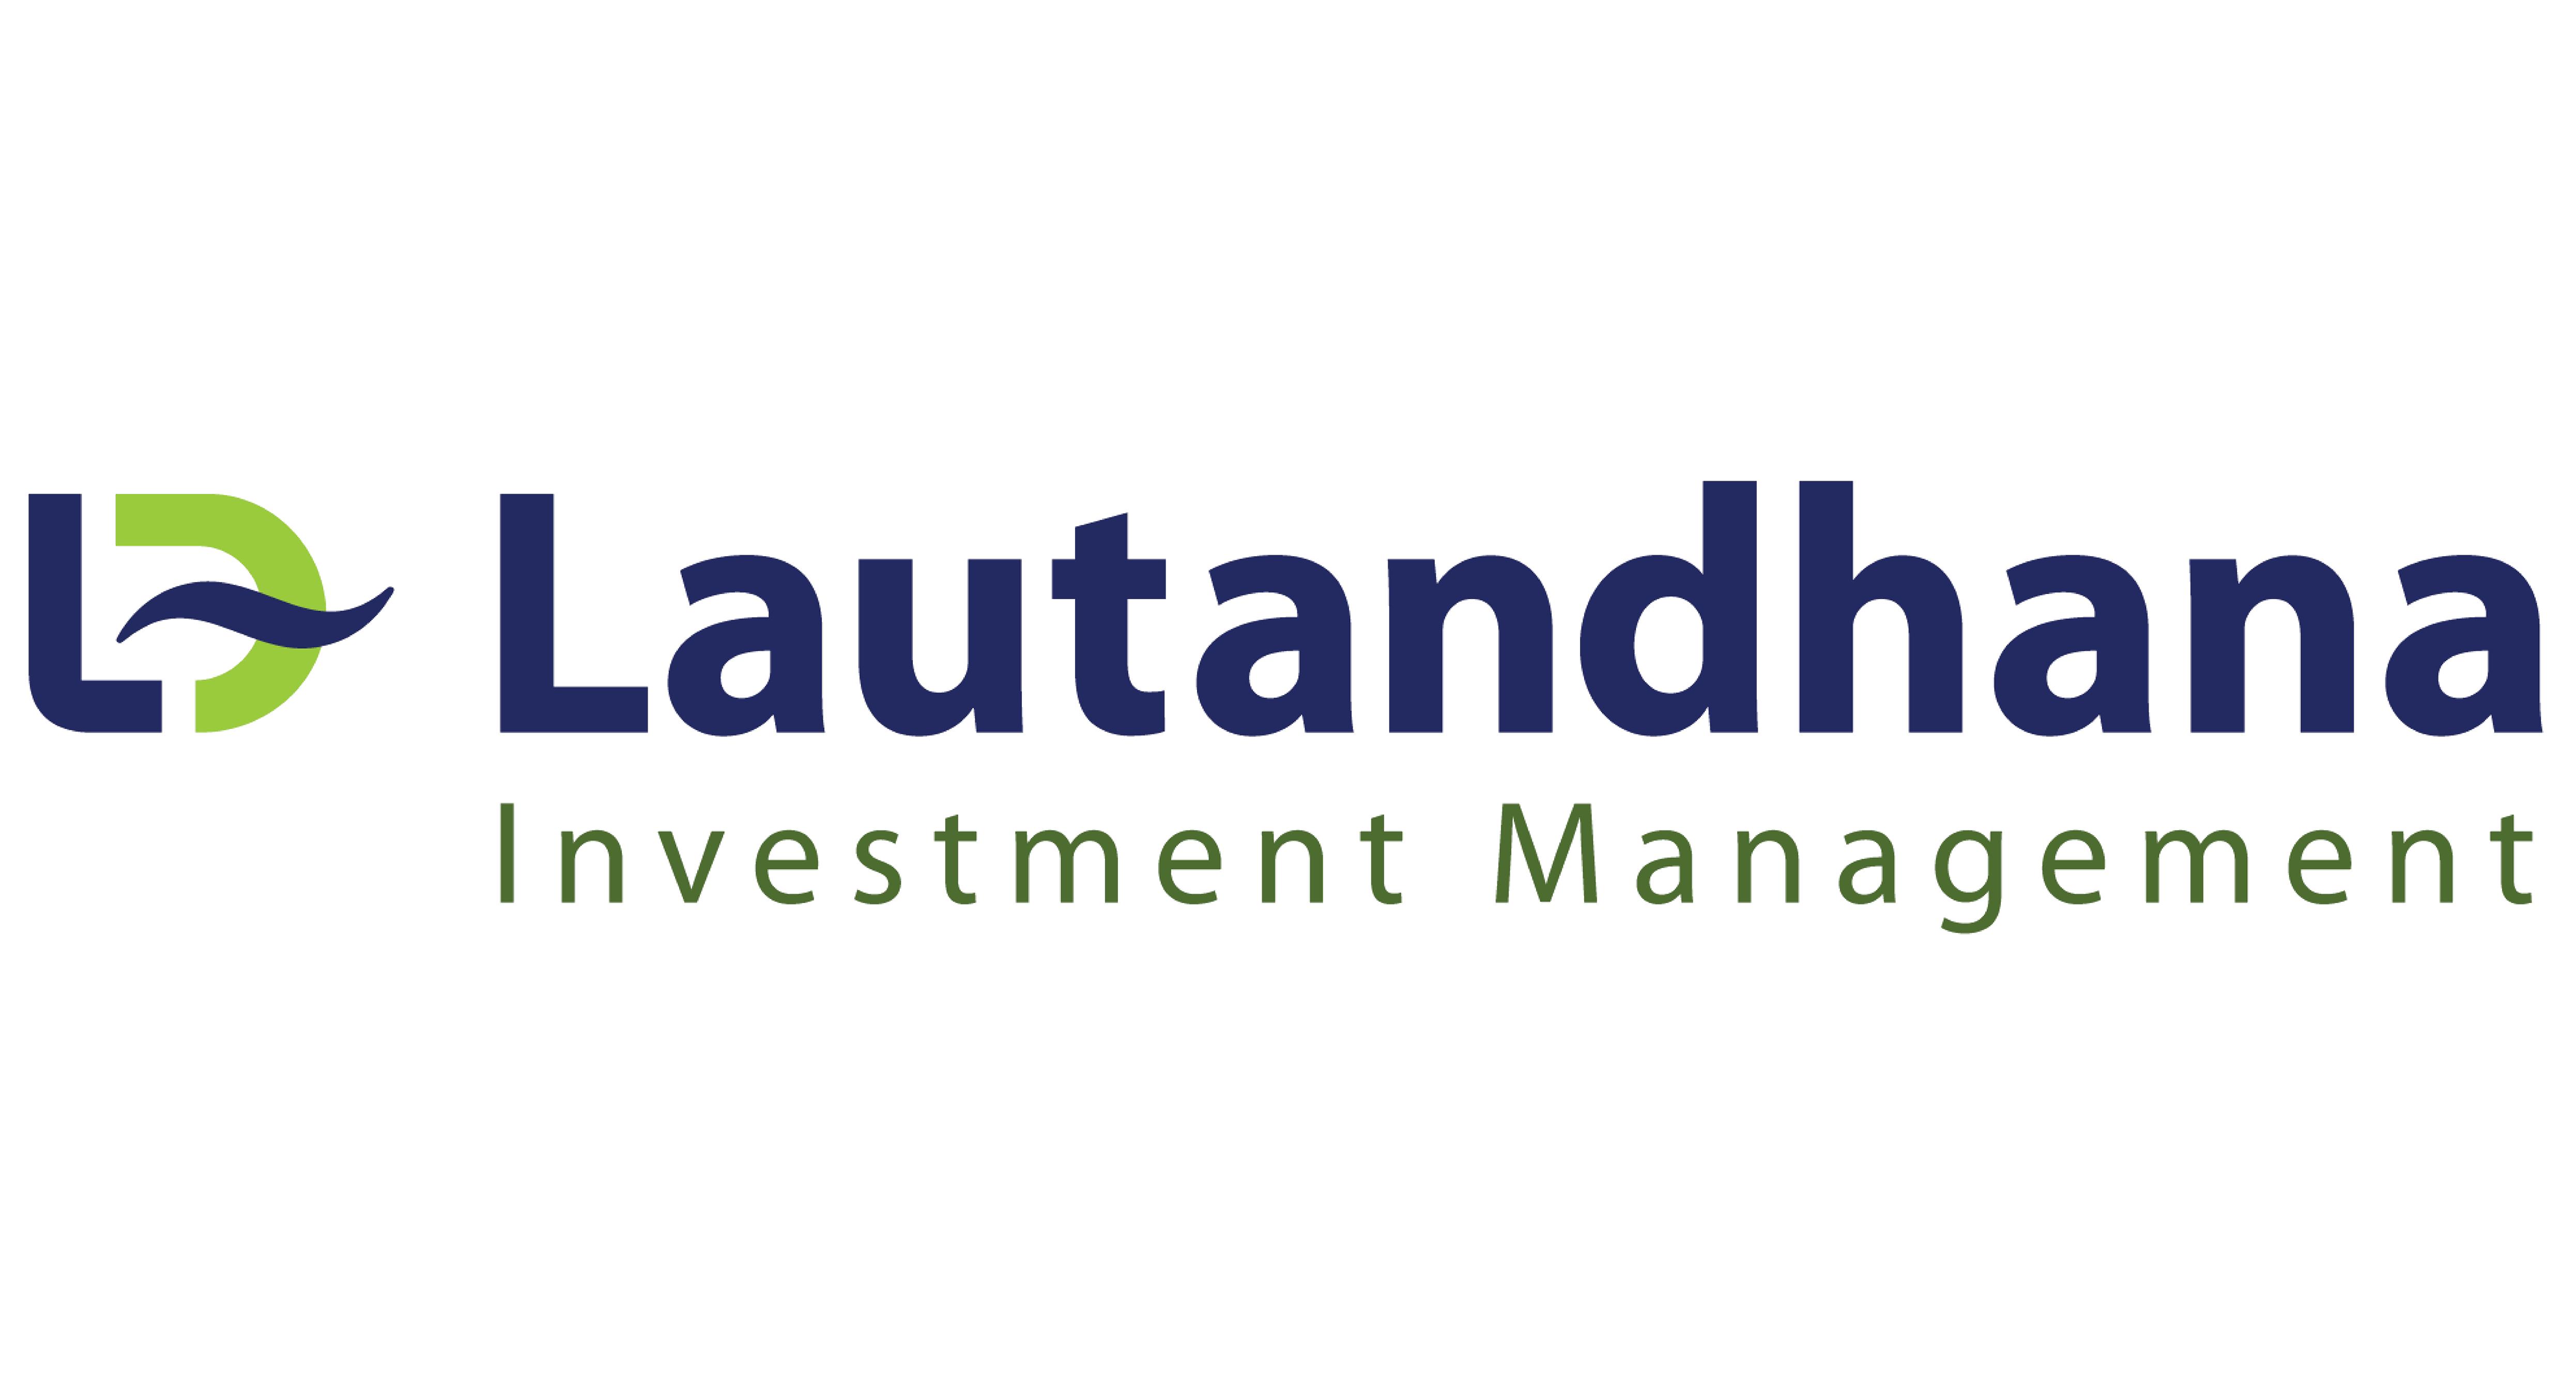 Lautandhana Investment Management